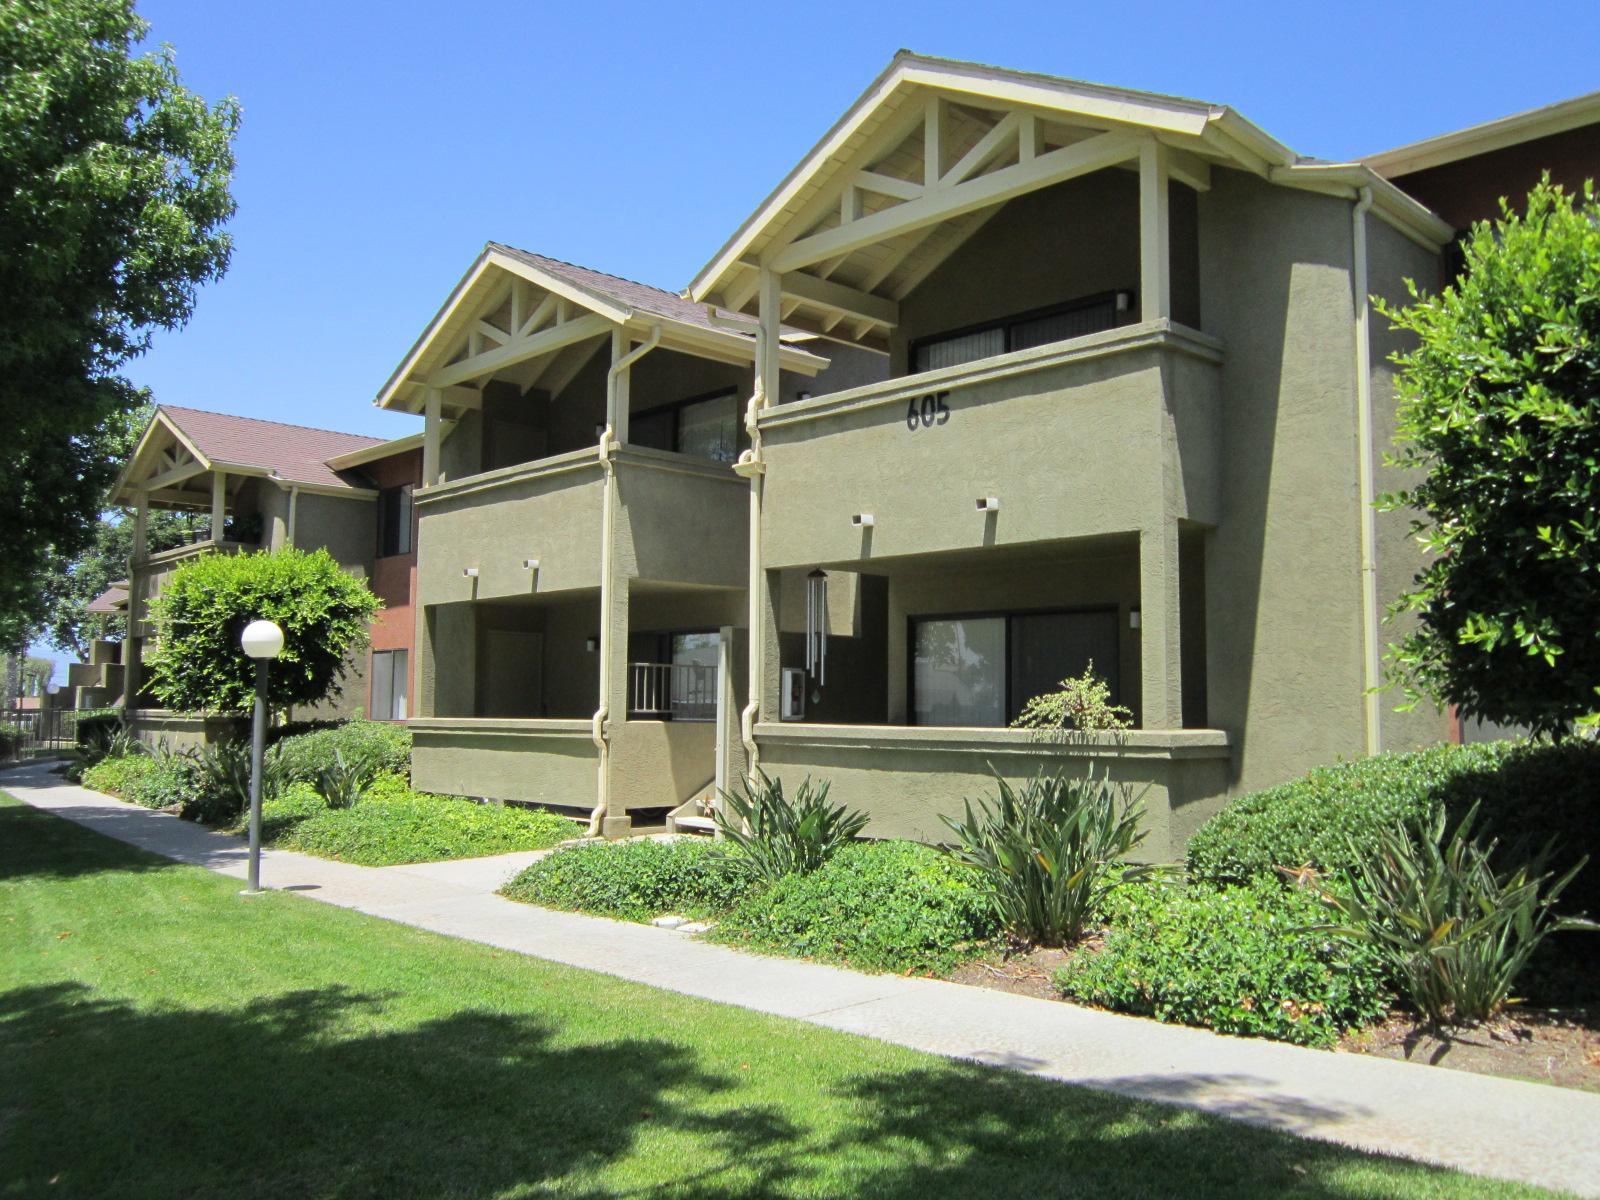 Sold - Windsong Apartments - Chula Vista, Ca.